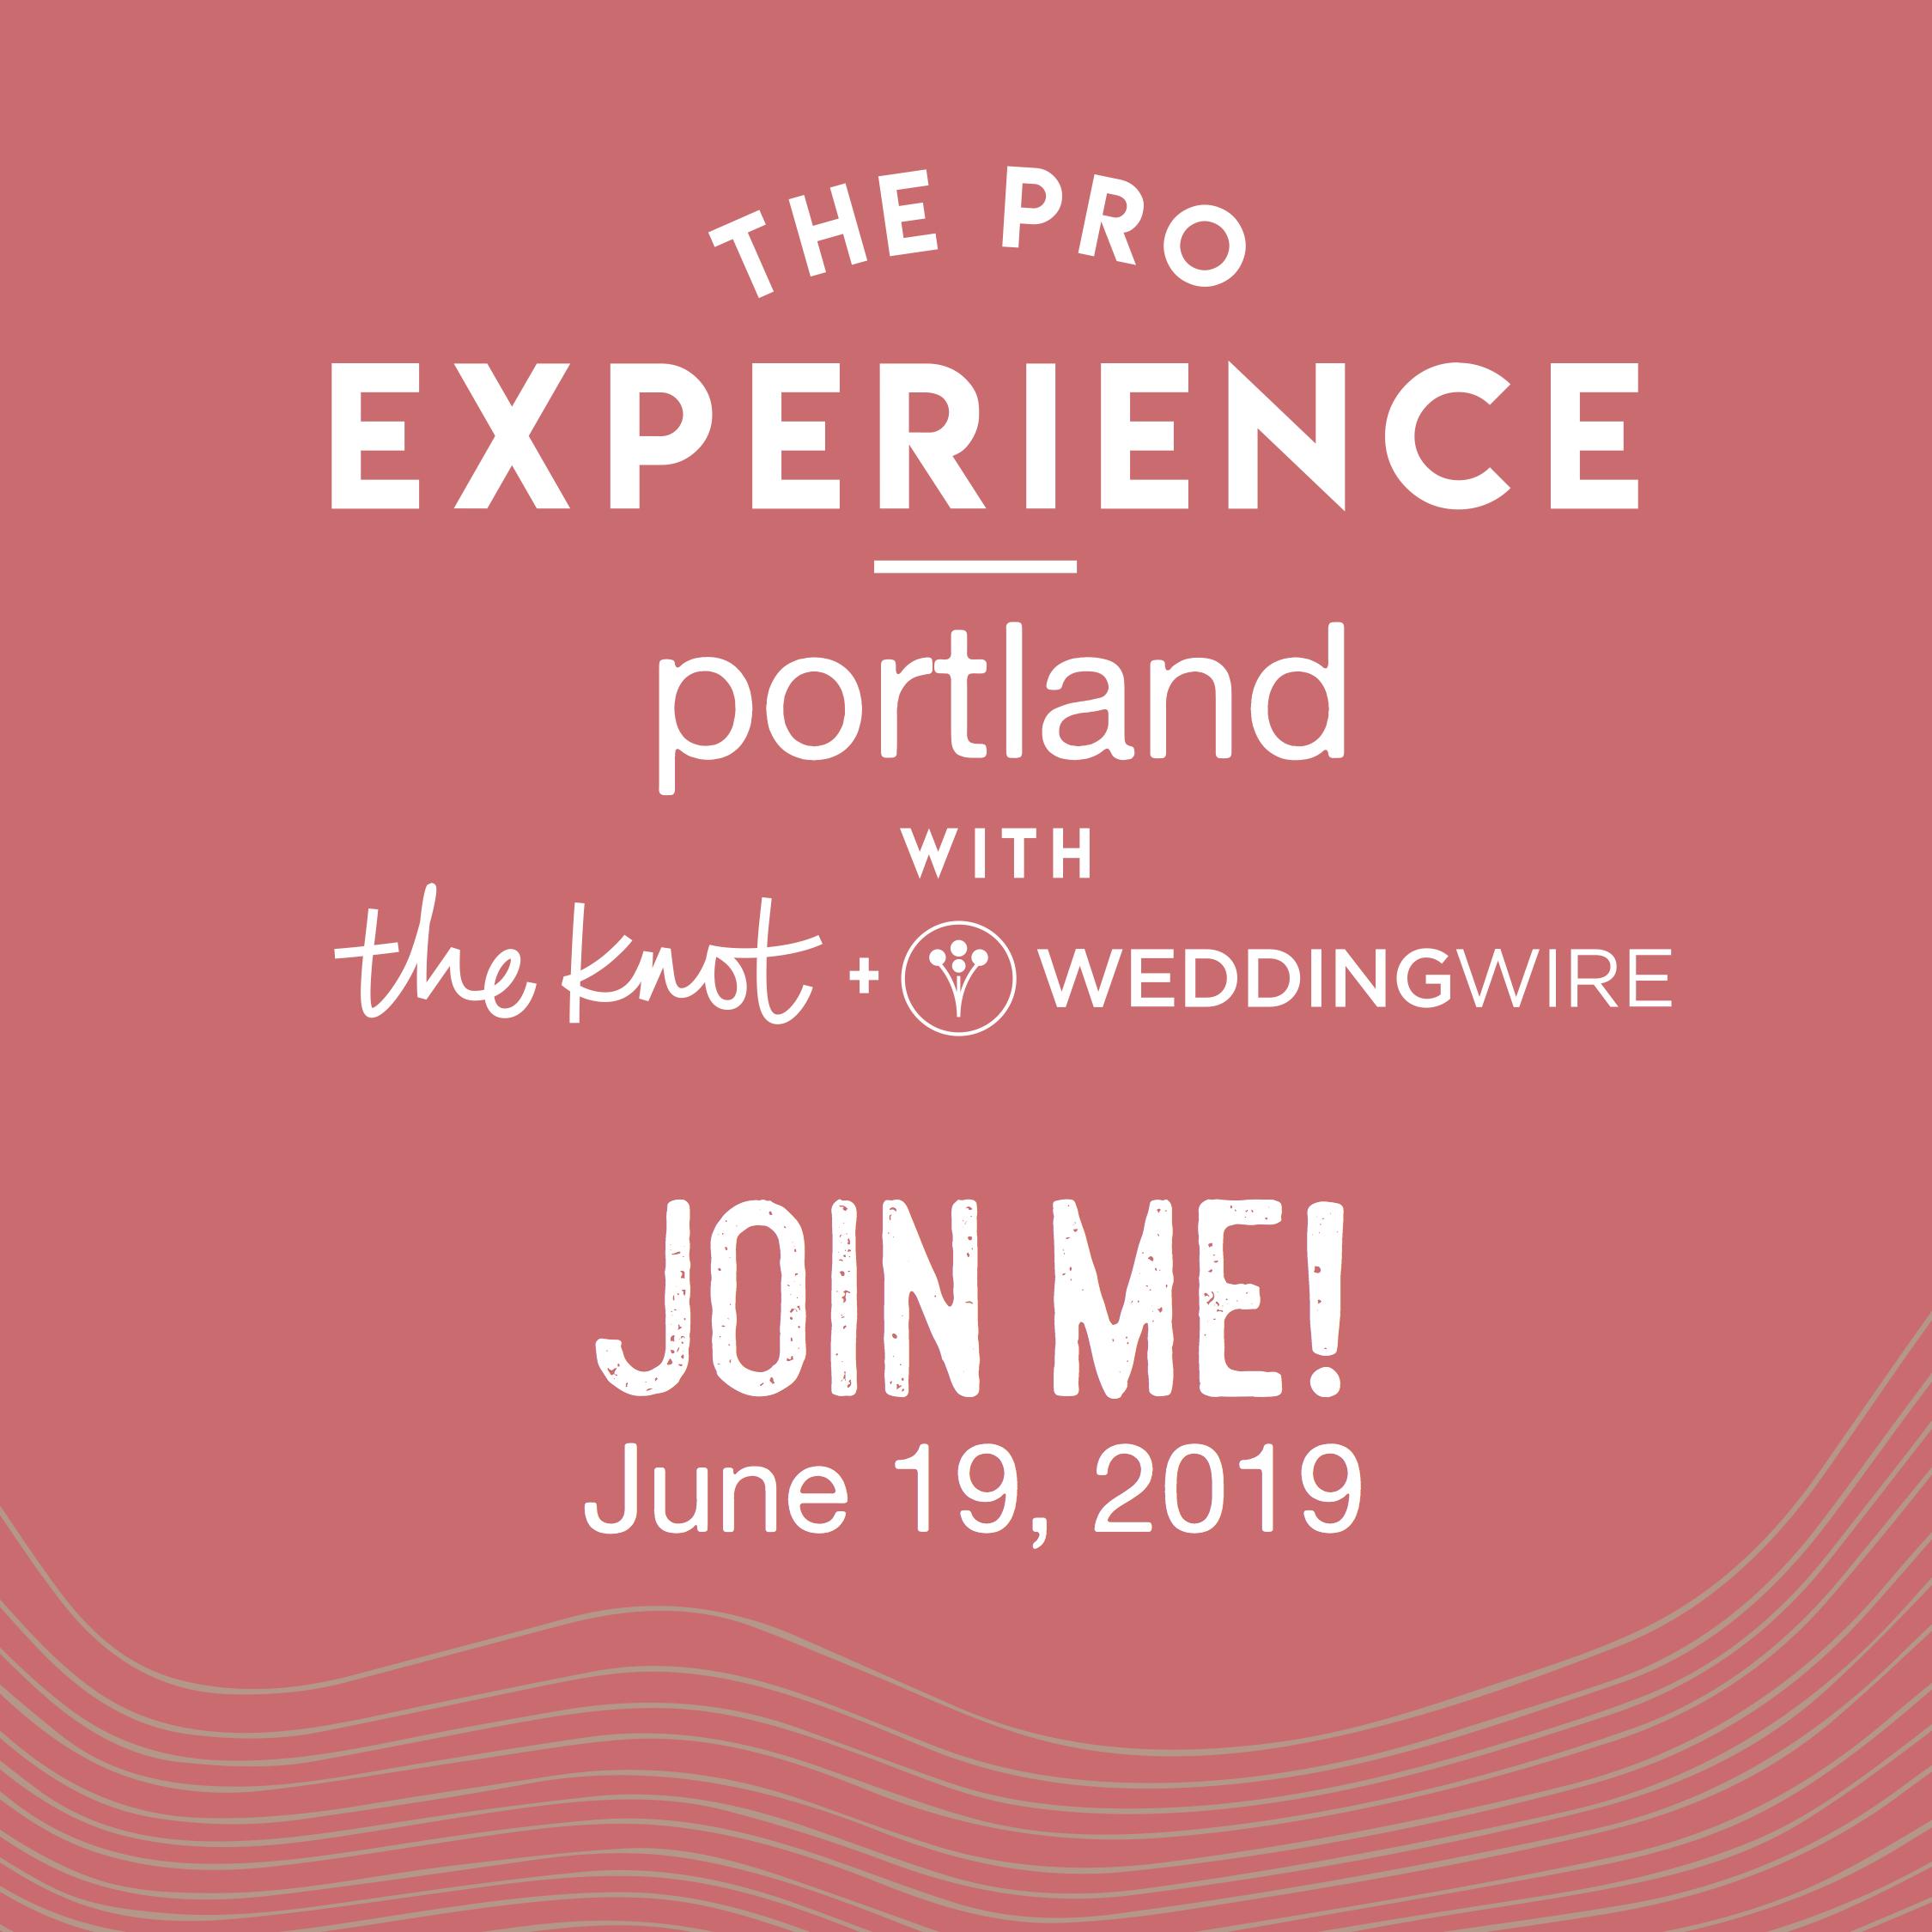 1080x1080-TheProE-Portland-JoinMeGraphic.jpg